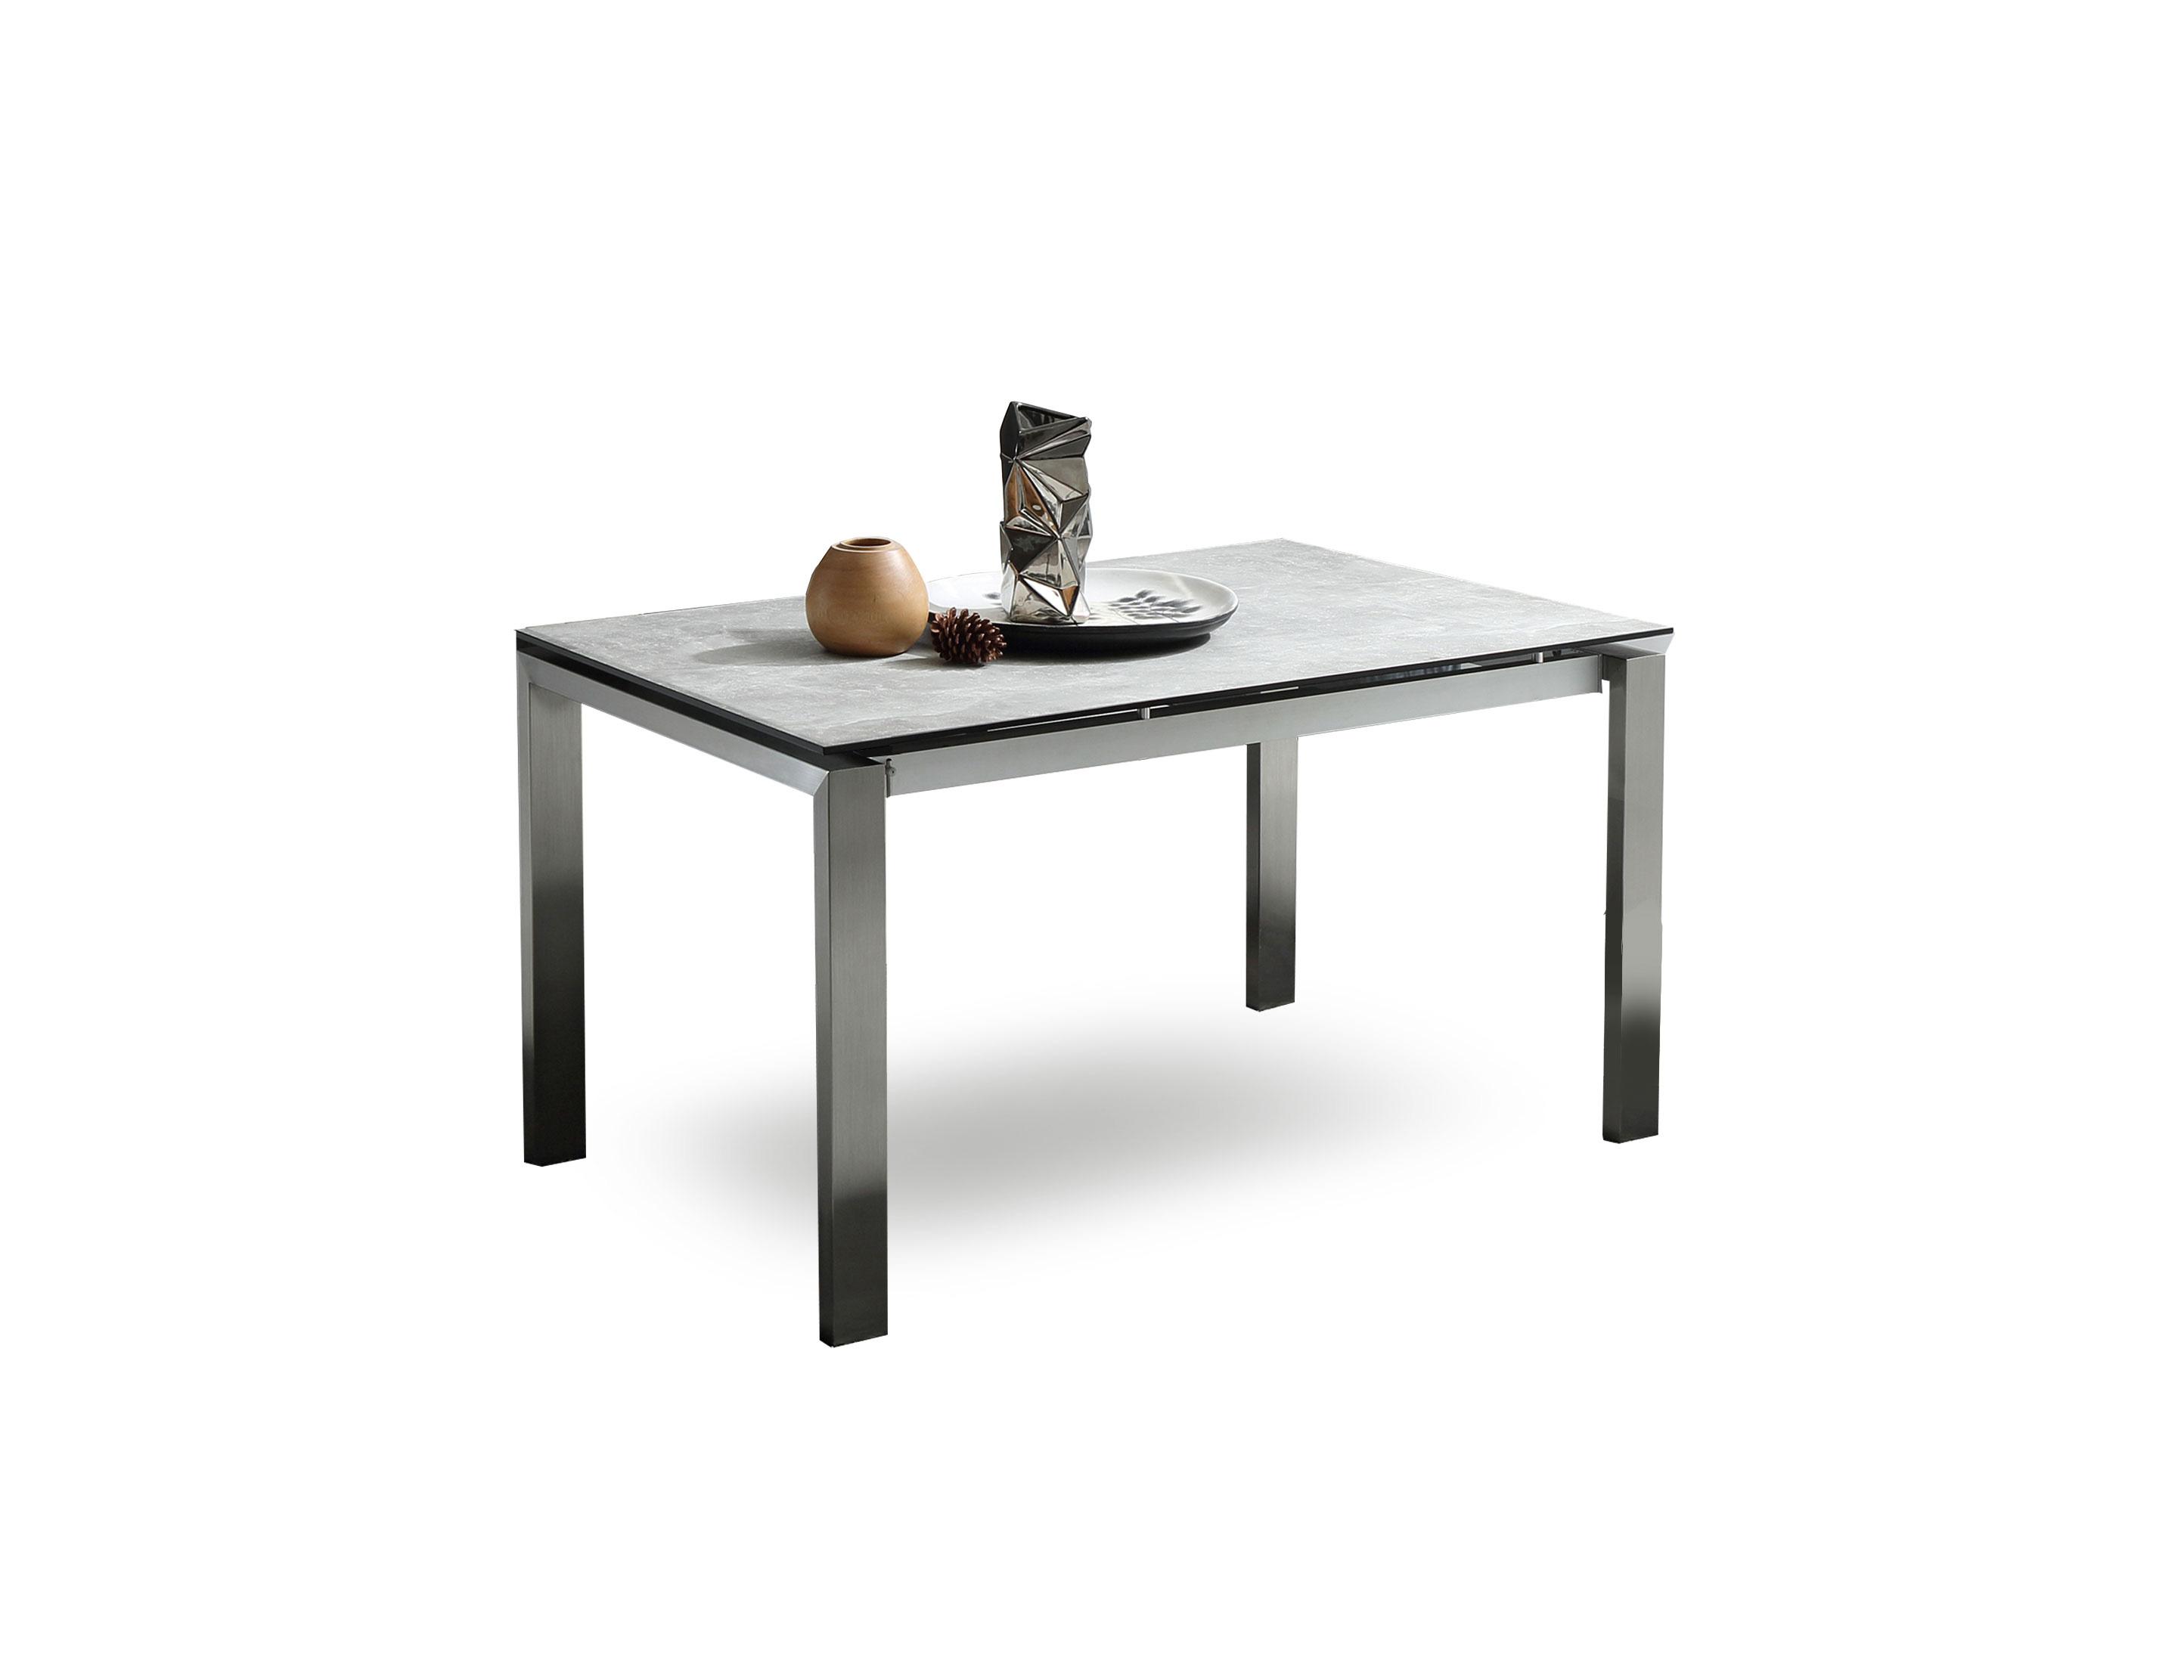 The Slate: Grey Ceramic Glass Top Table